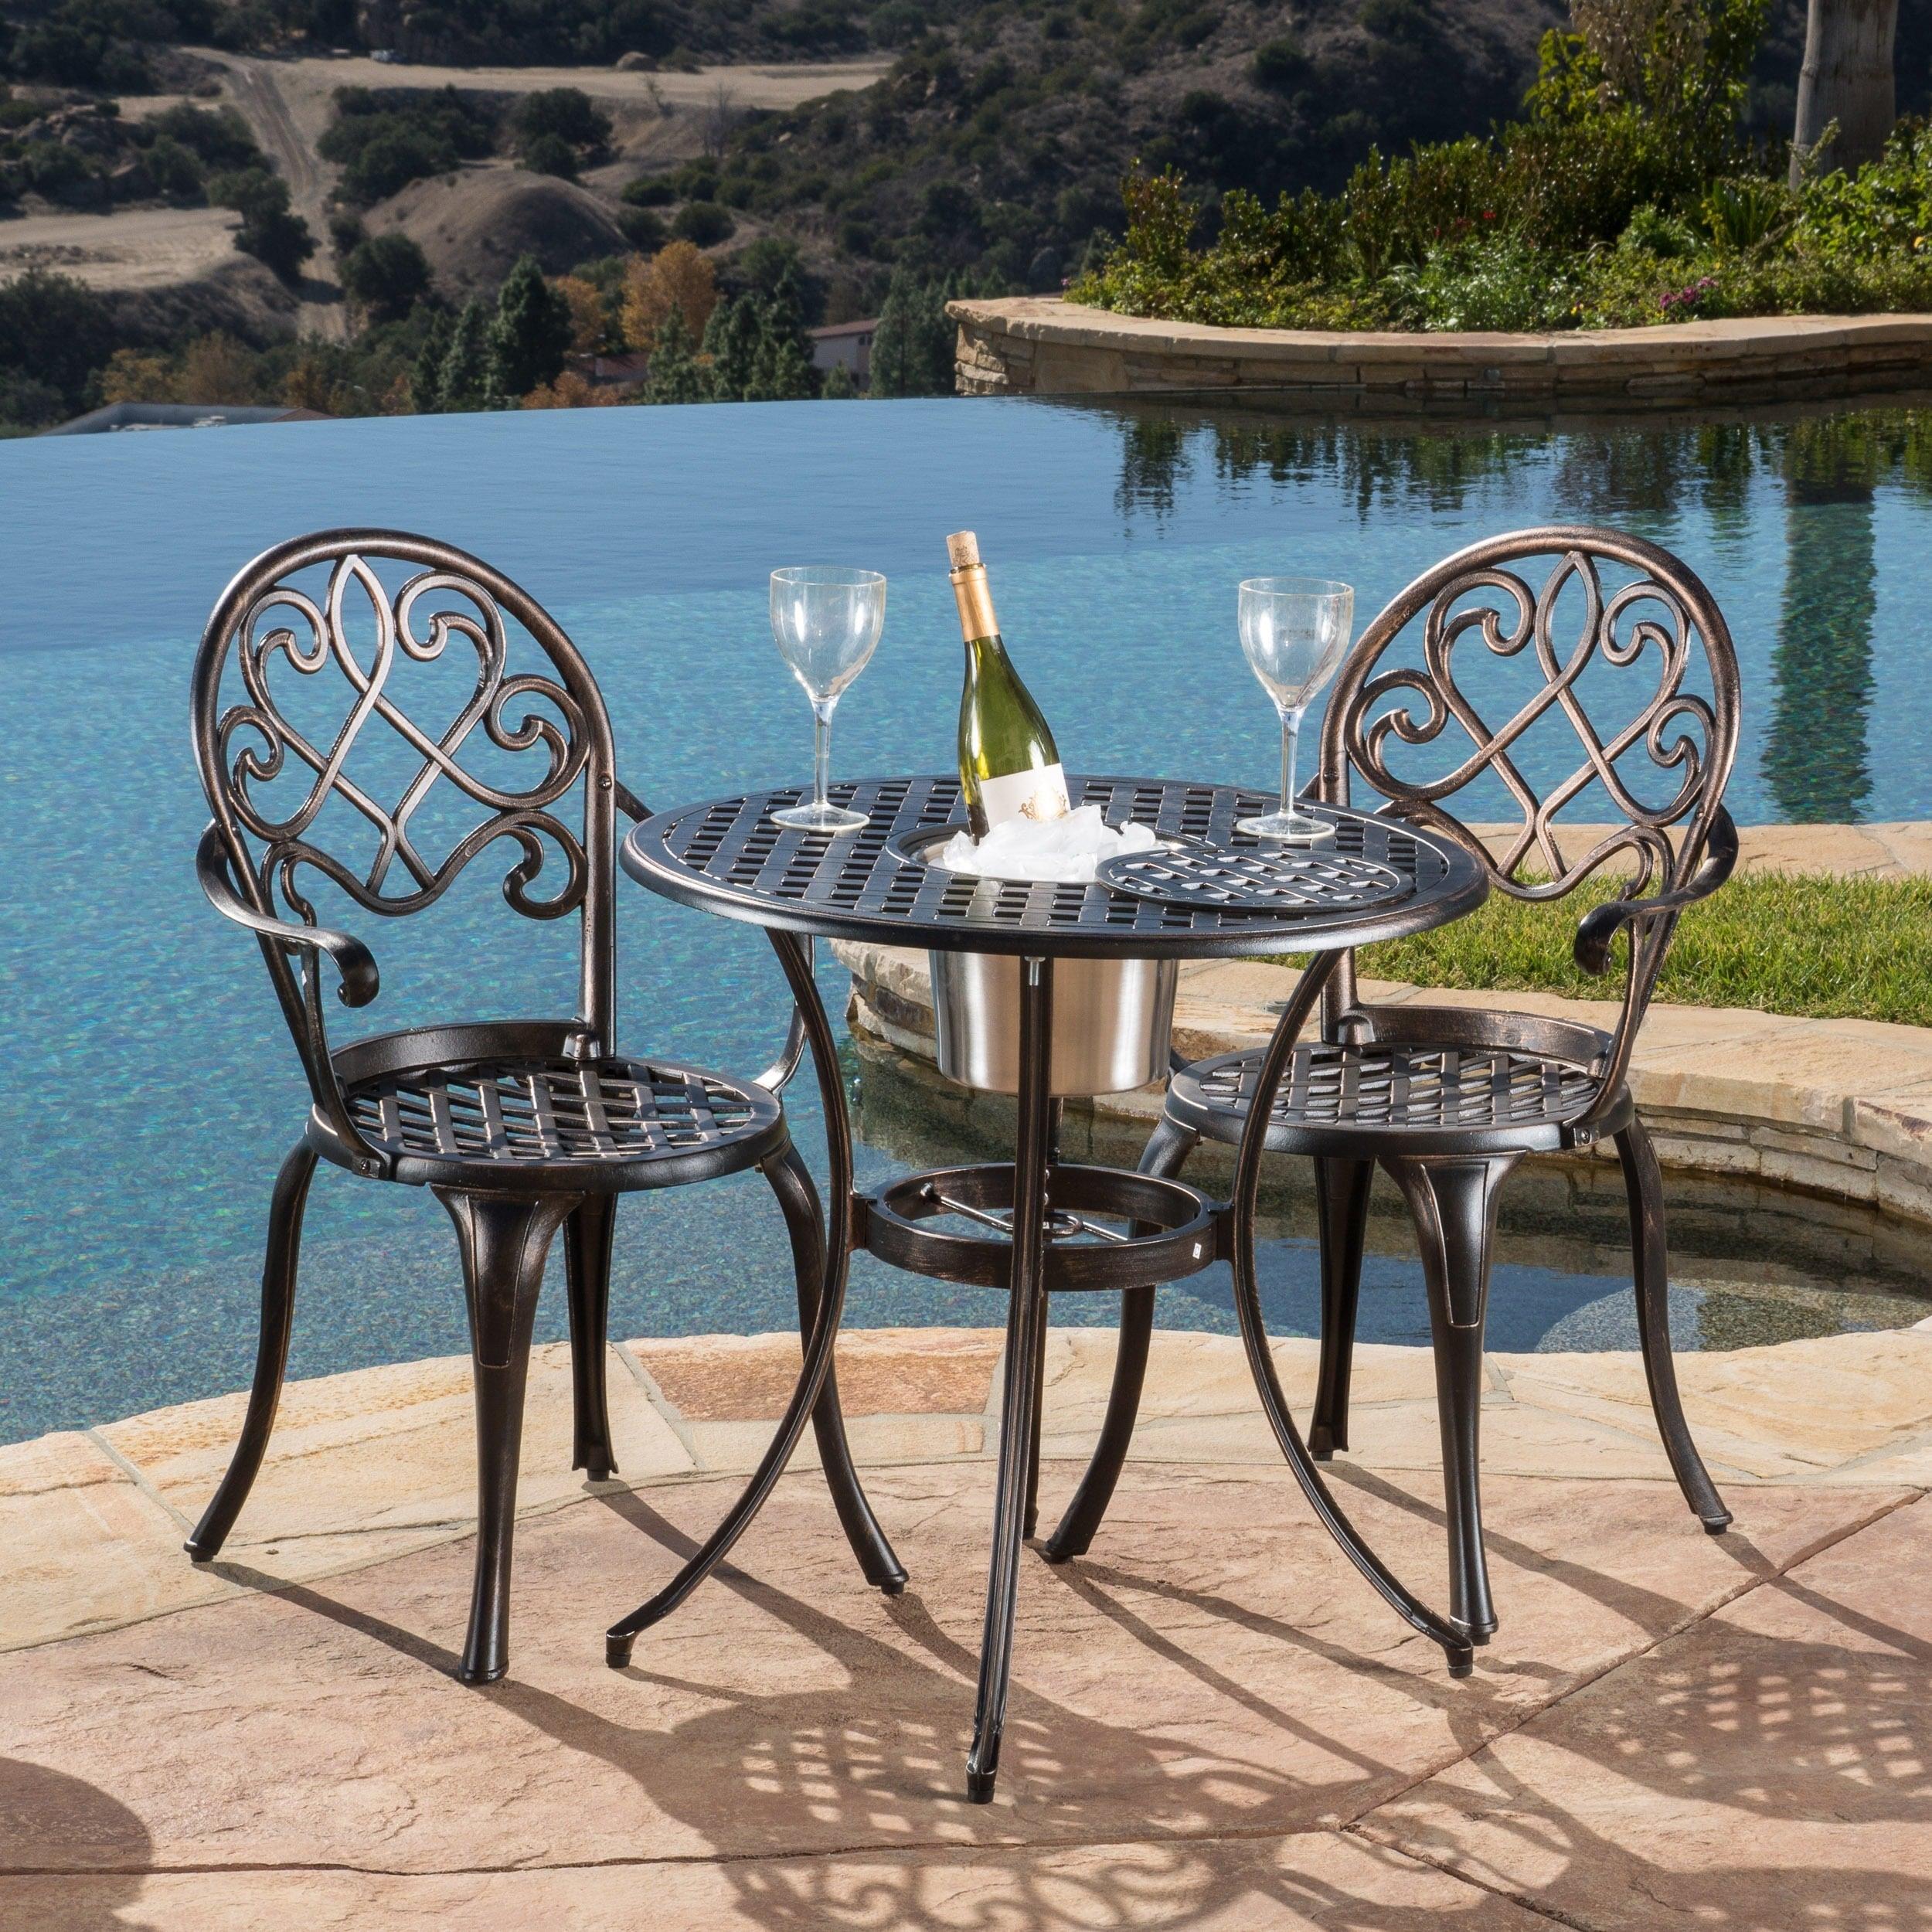 Angeles Cast Aluminum Outdoor Bistro Furniture Set with I...